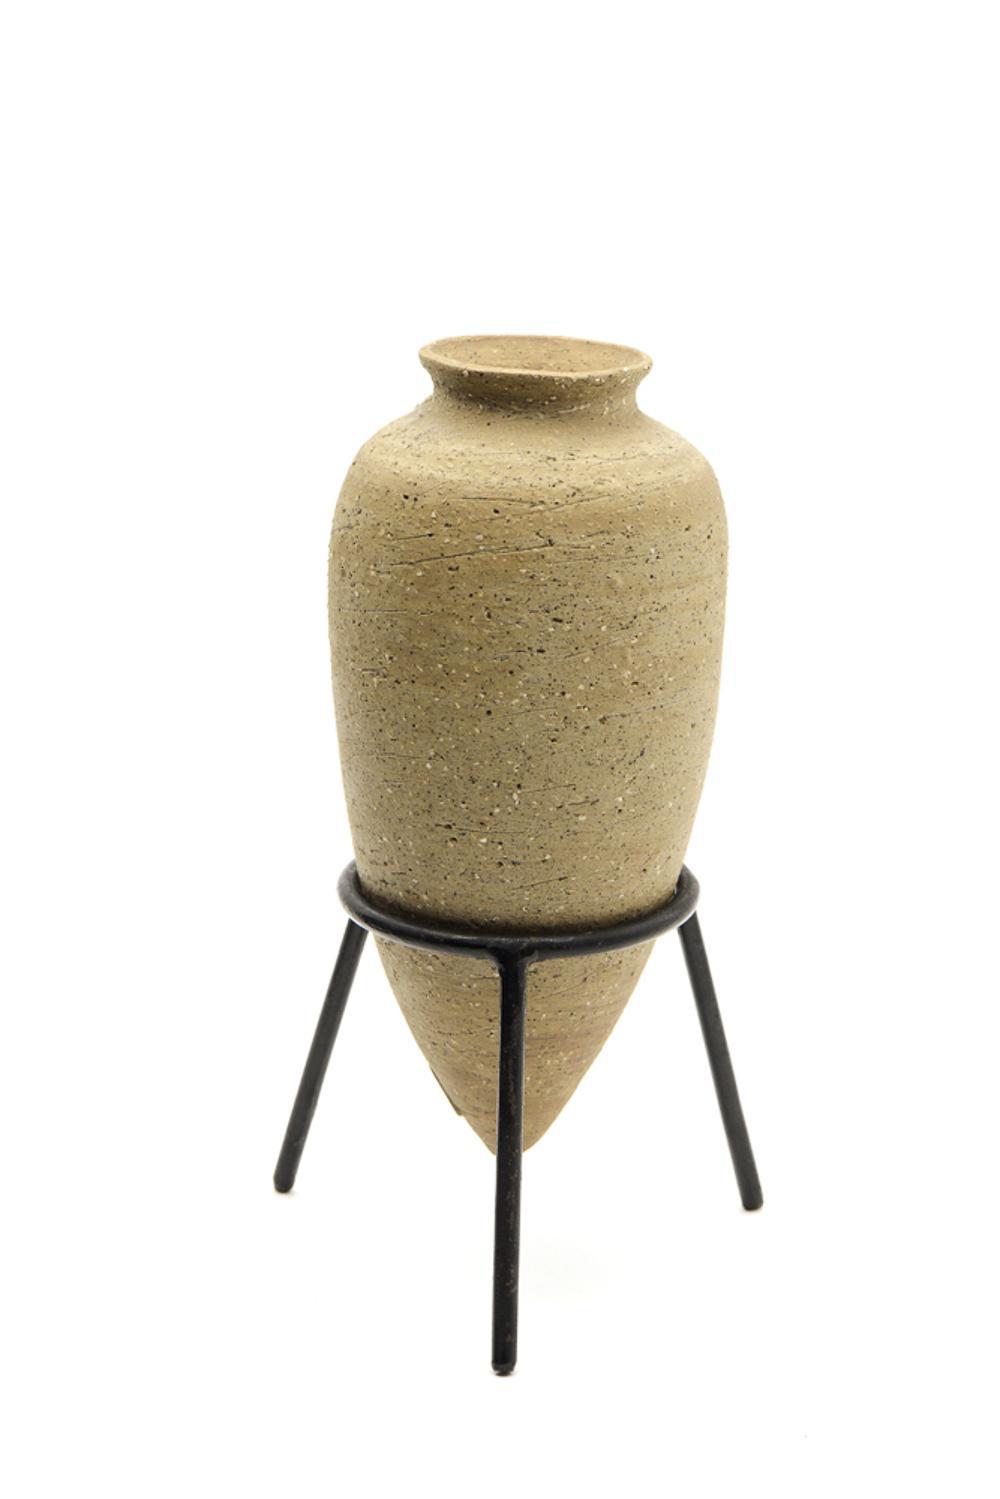 Ceramic amphora with metal support